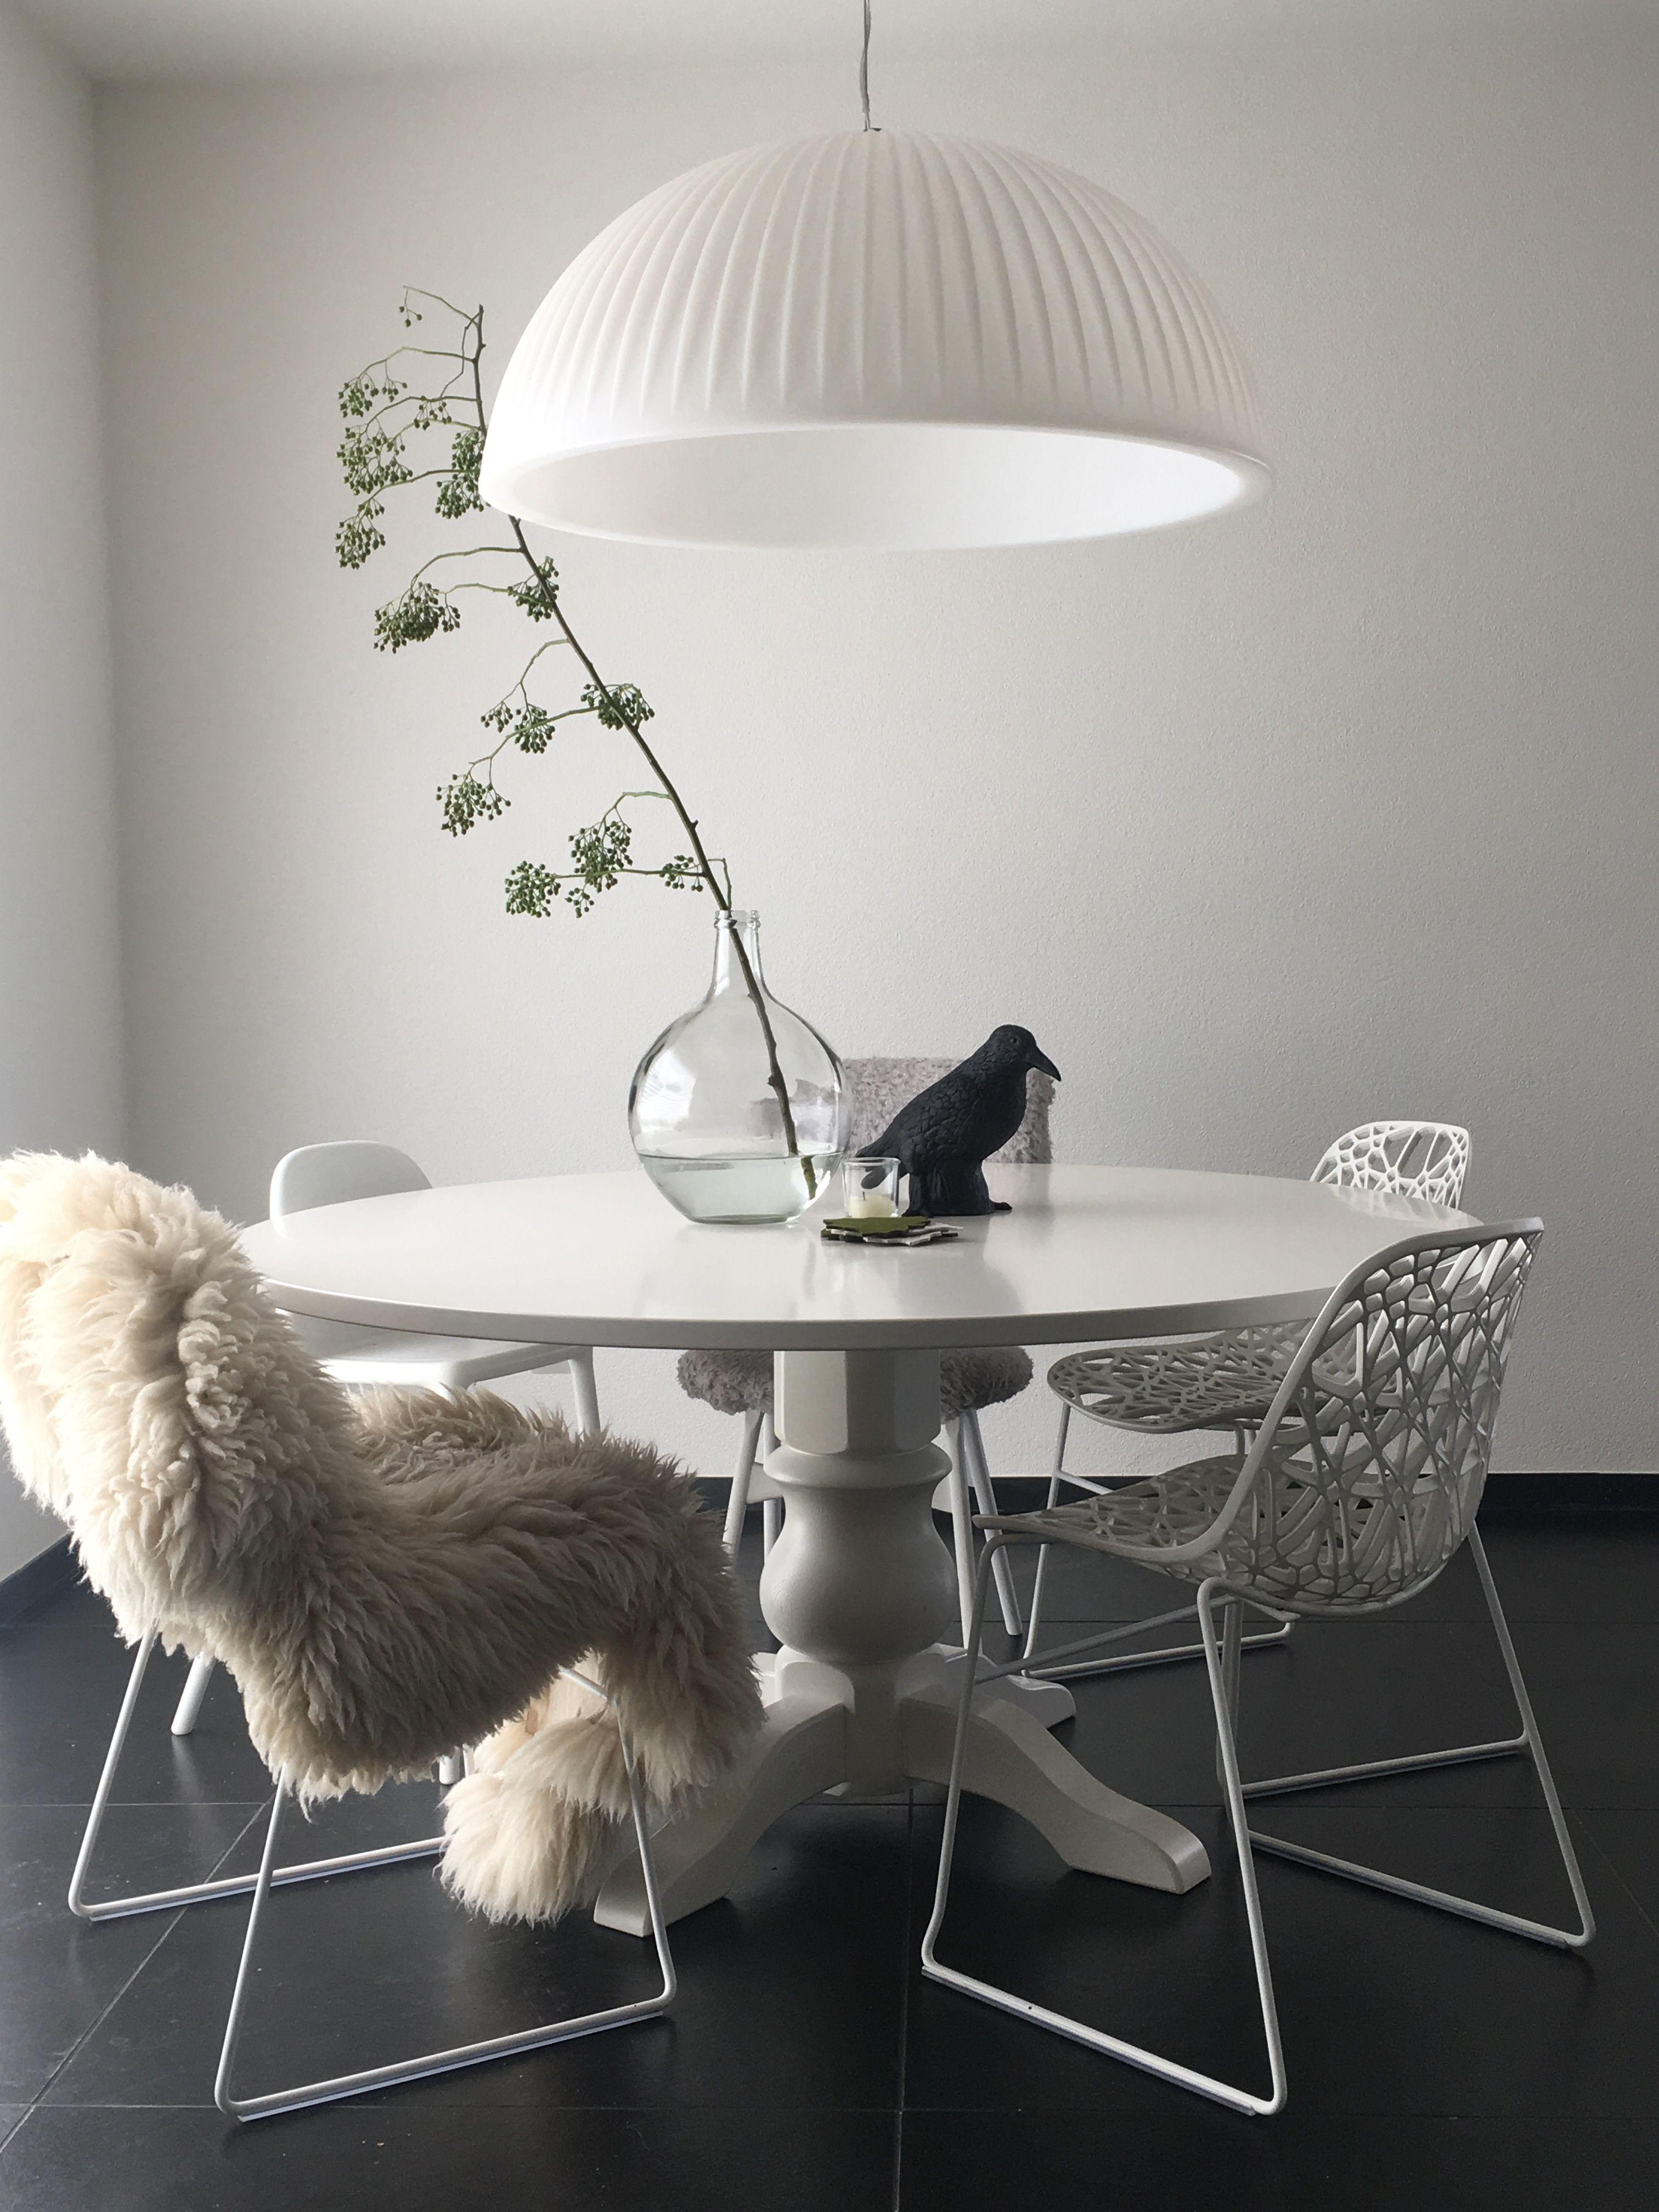 Eettafel Wit Design.Ronde Eettafel Wit Interieur Home Dining Dining Room Room